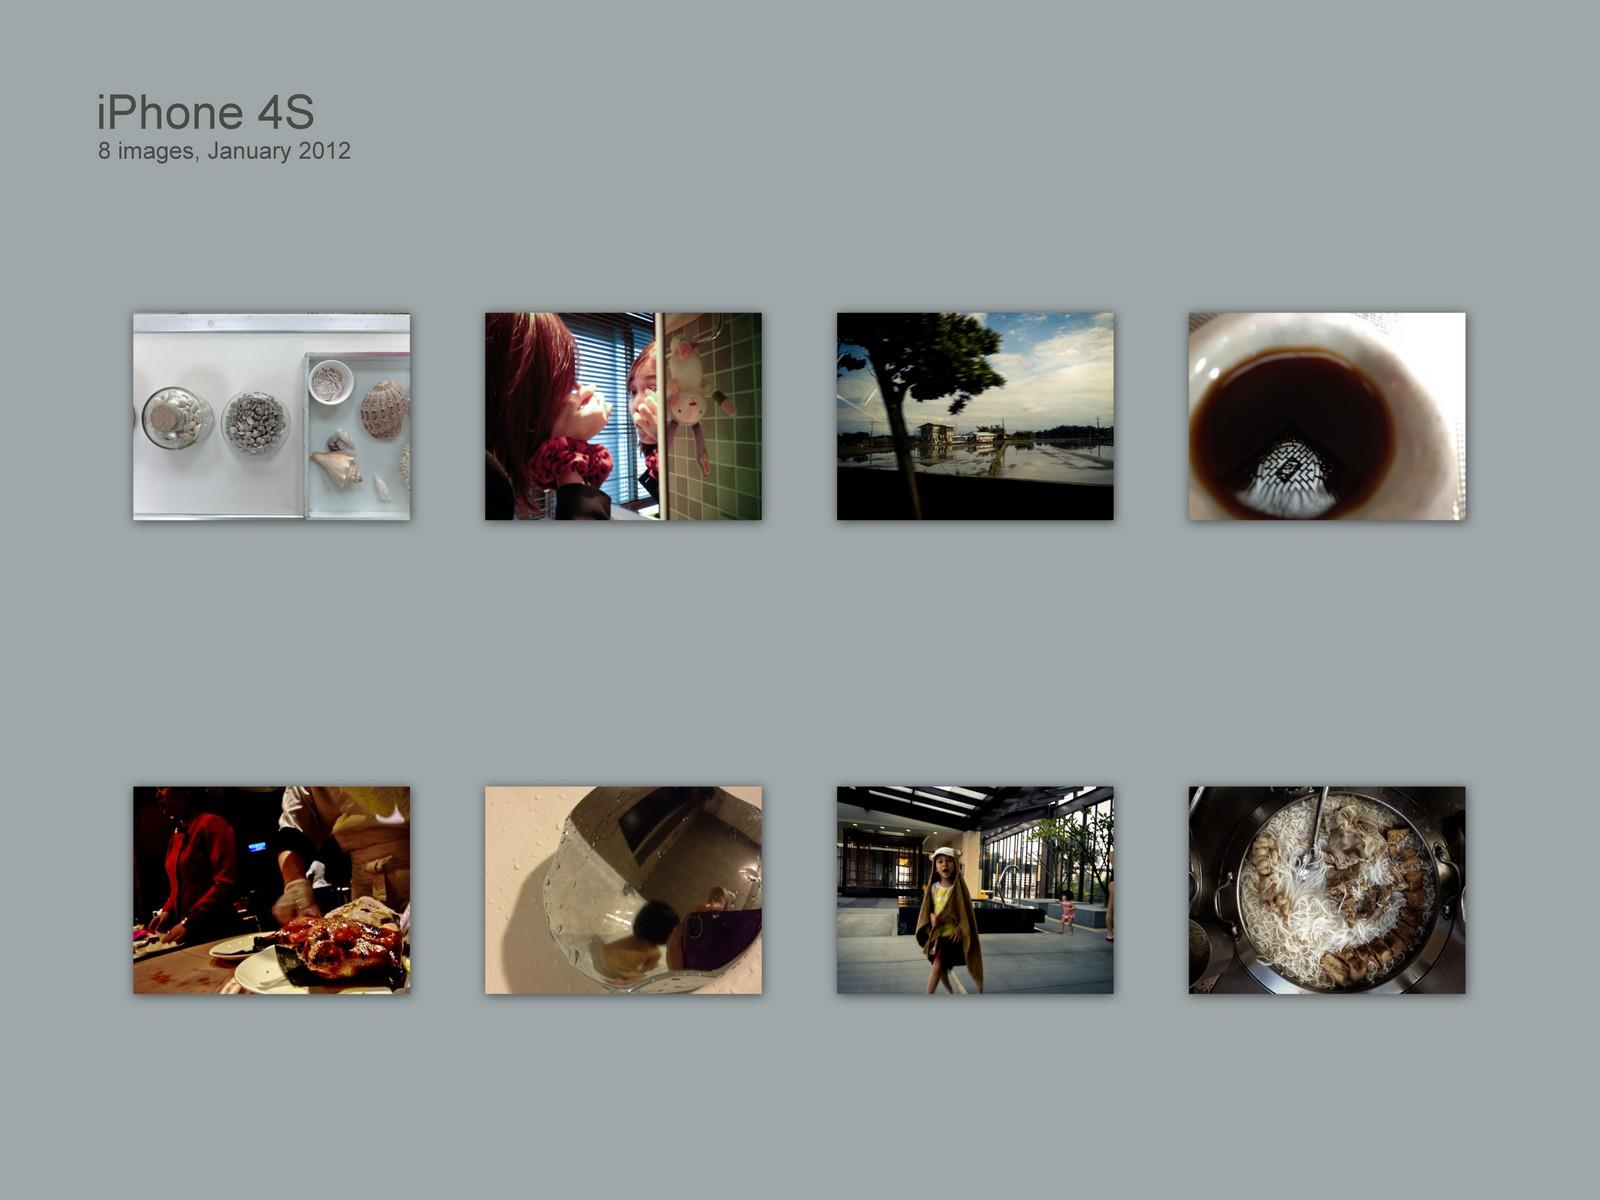 iPhone 用戶大多善於拍攝創意與後製強化照片